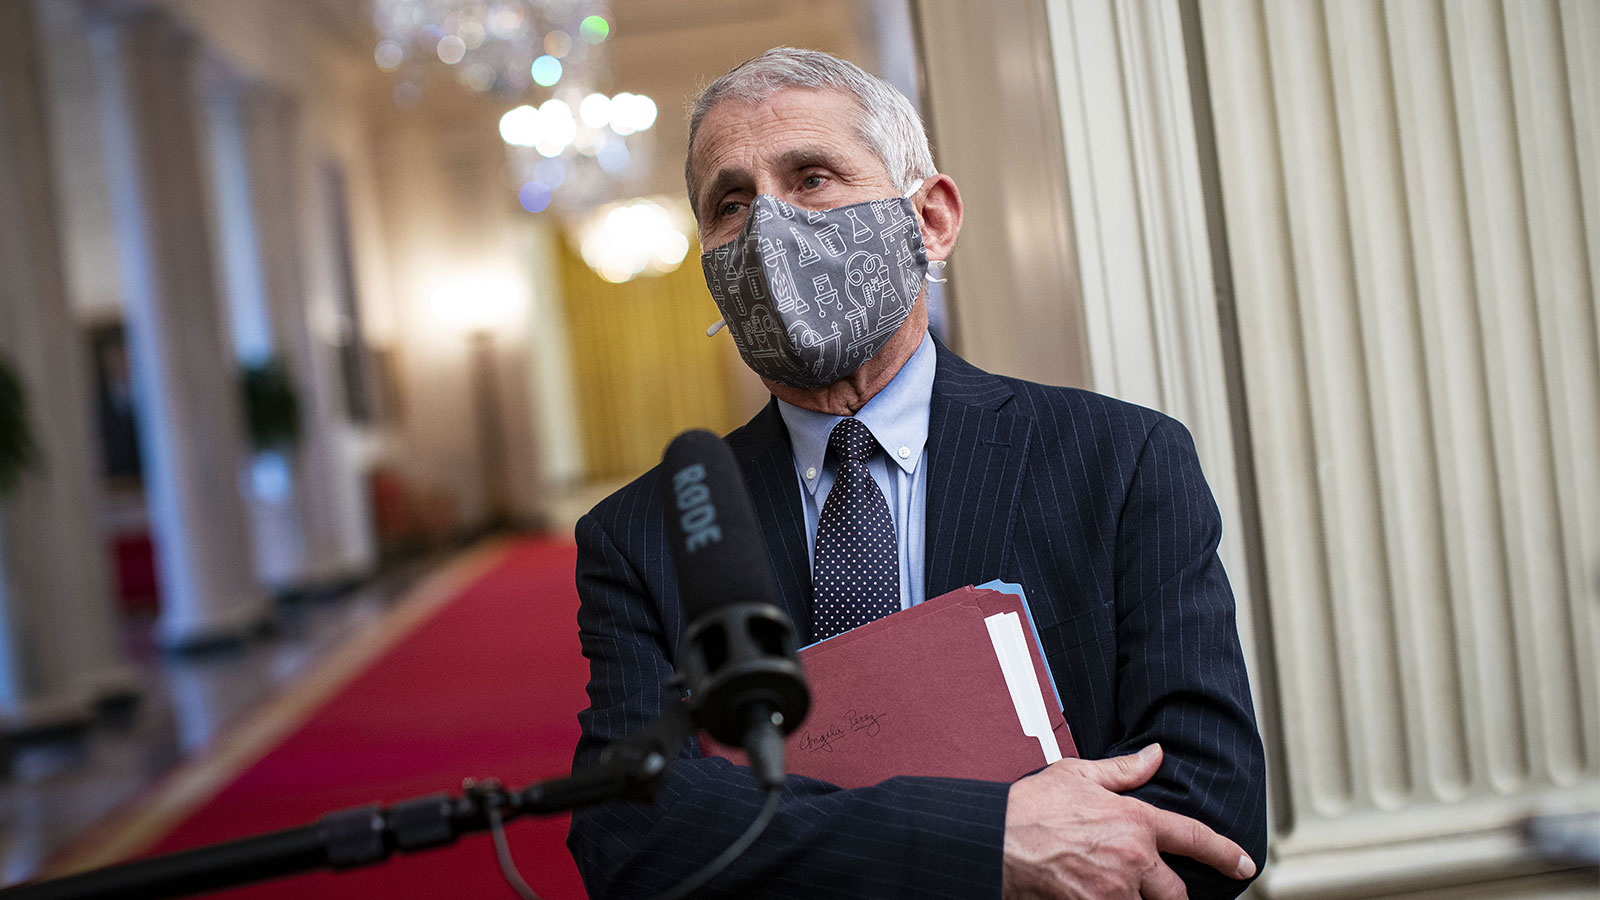 Re: Prohibiting Congressional Testimony